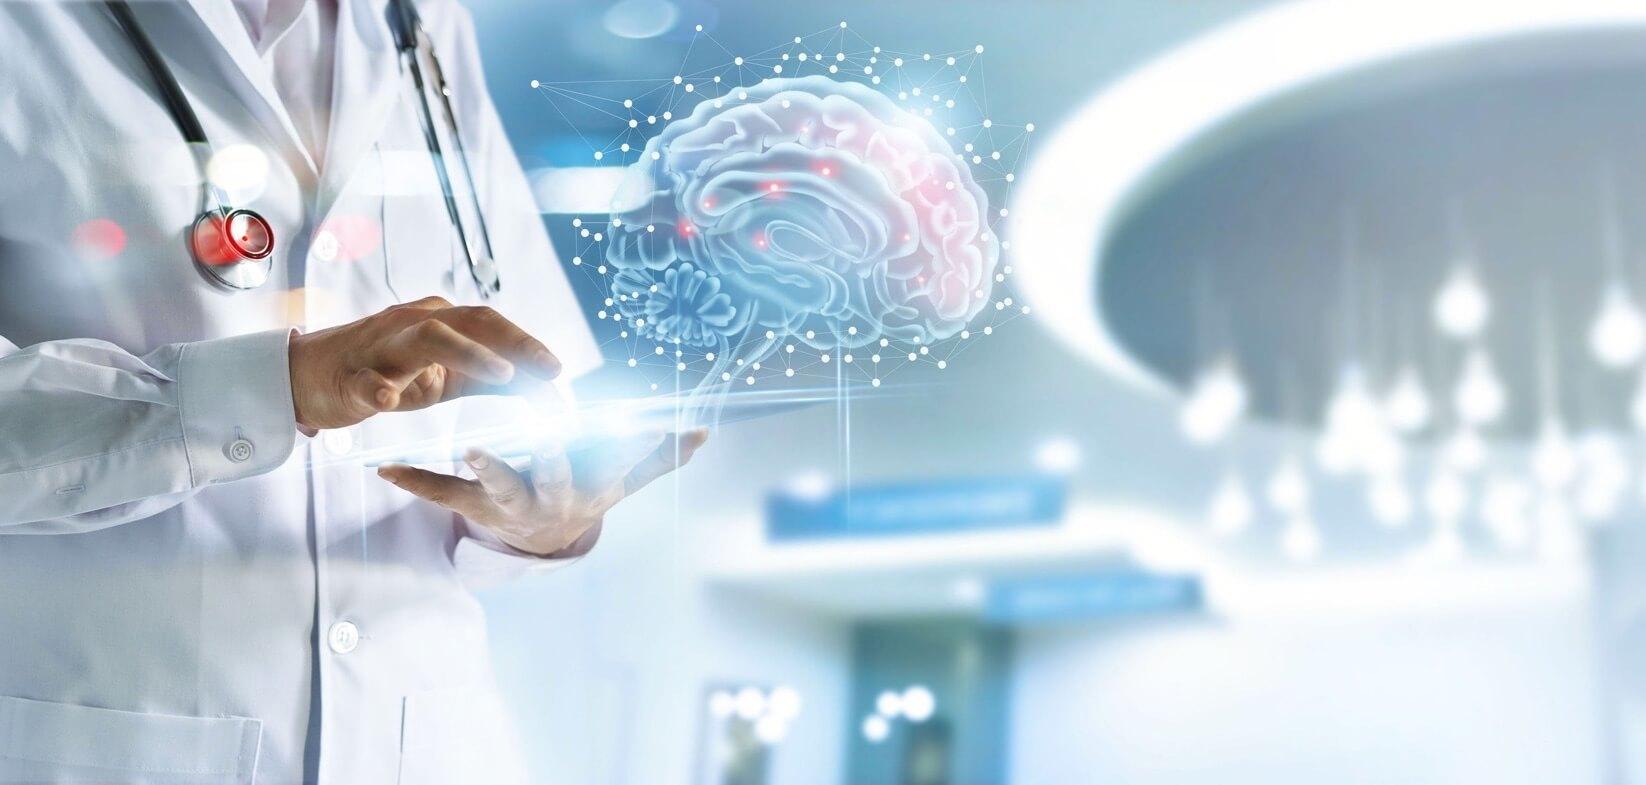 опухоль мозга лечение корея